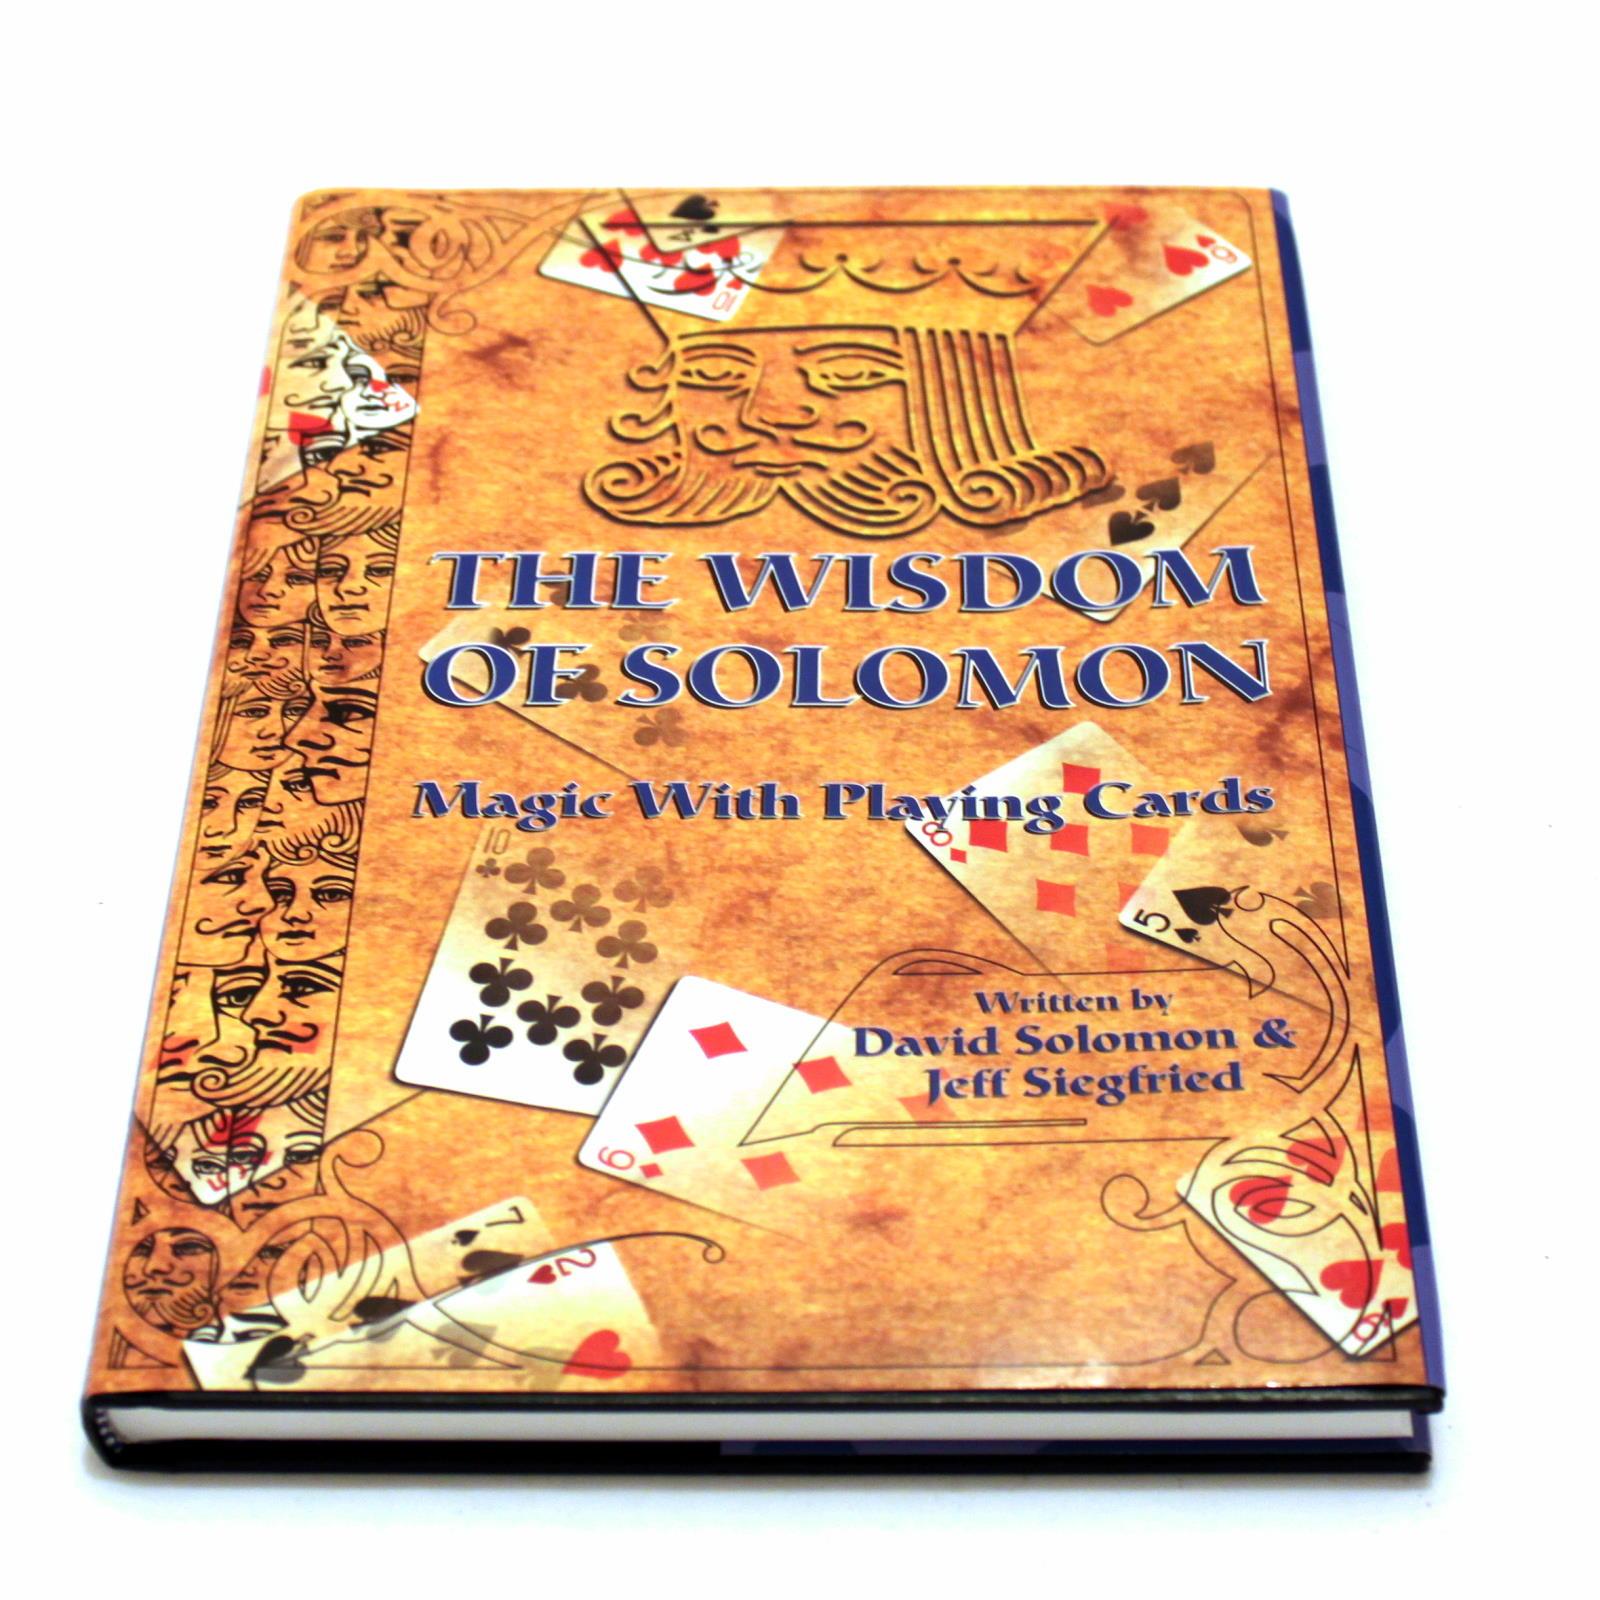 Wisdom of Solomon, The by David Solomon, Jeff Siegfried